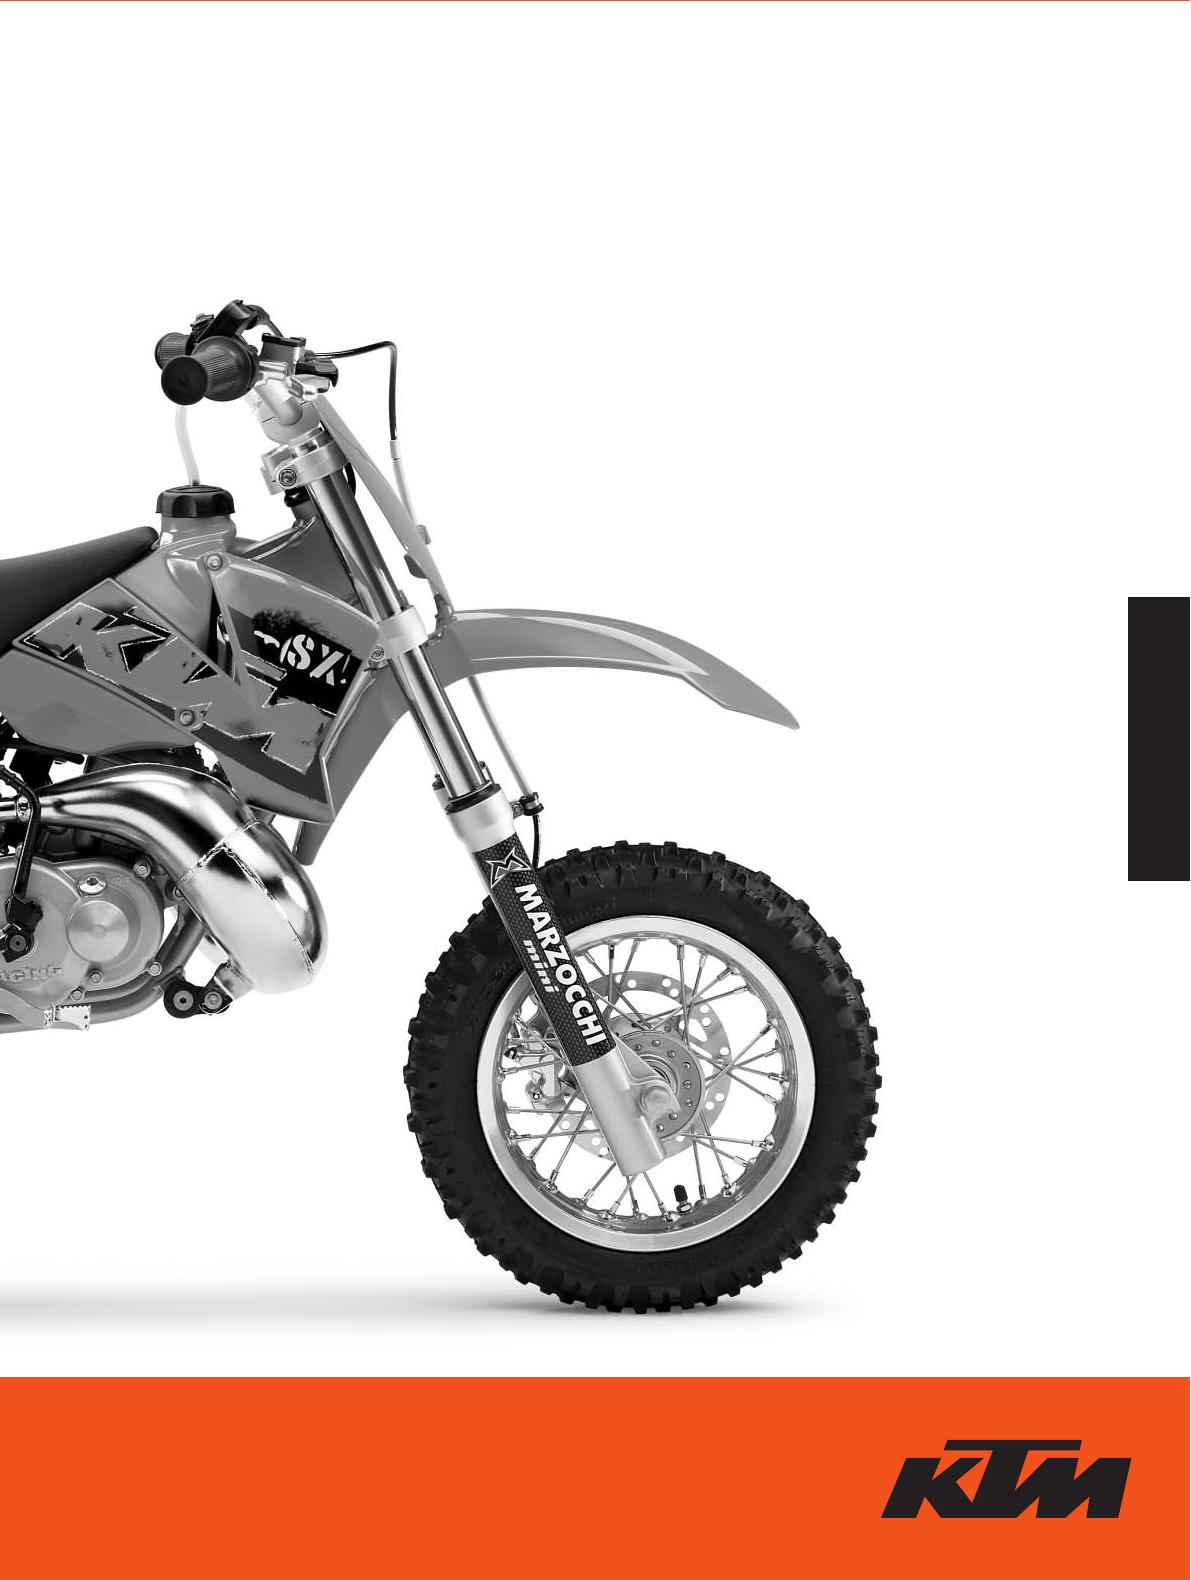 handleiding ktm 50 sx junior pagina 1 van 42 english rh gebruikershandleiding com KTM 50 Junior Specs KTM 50 SX Clutch